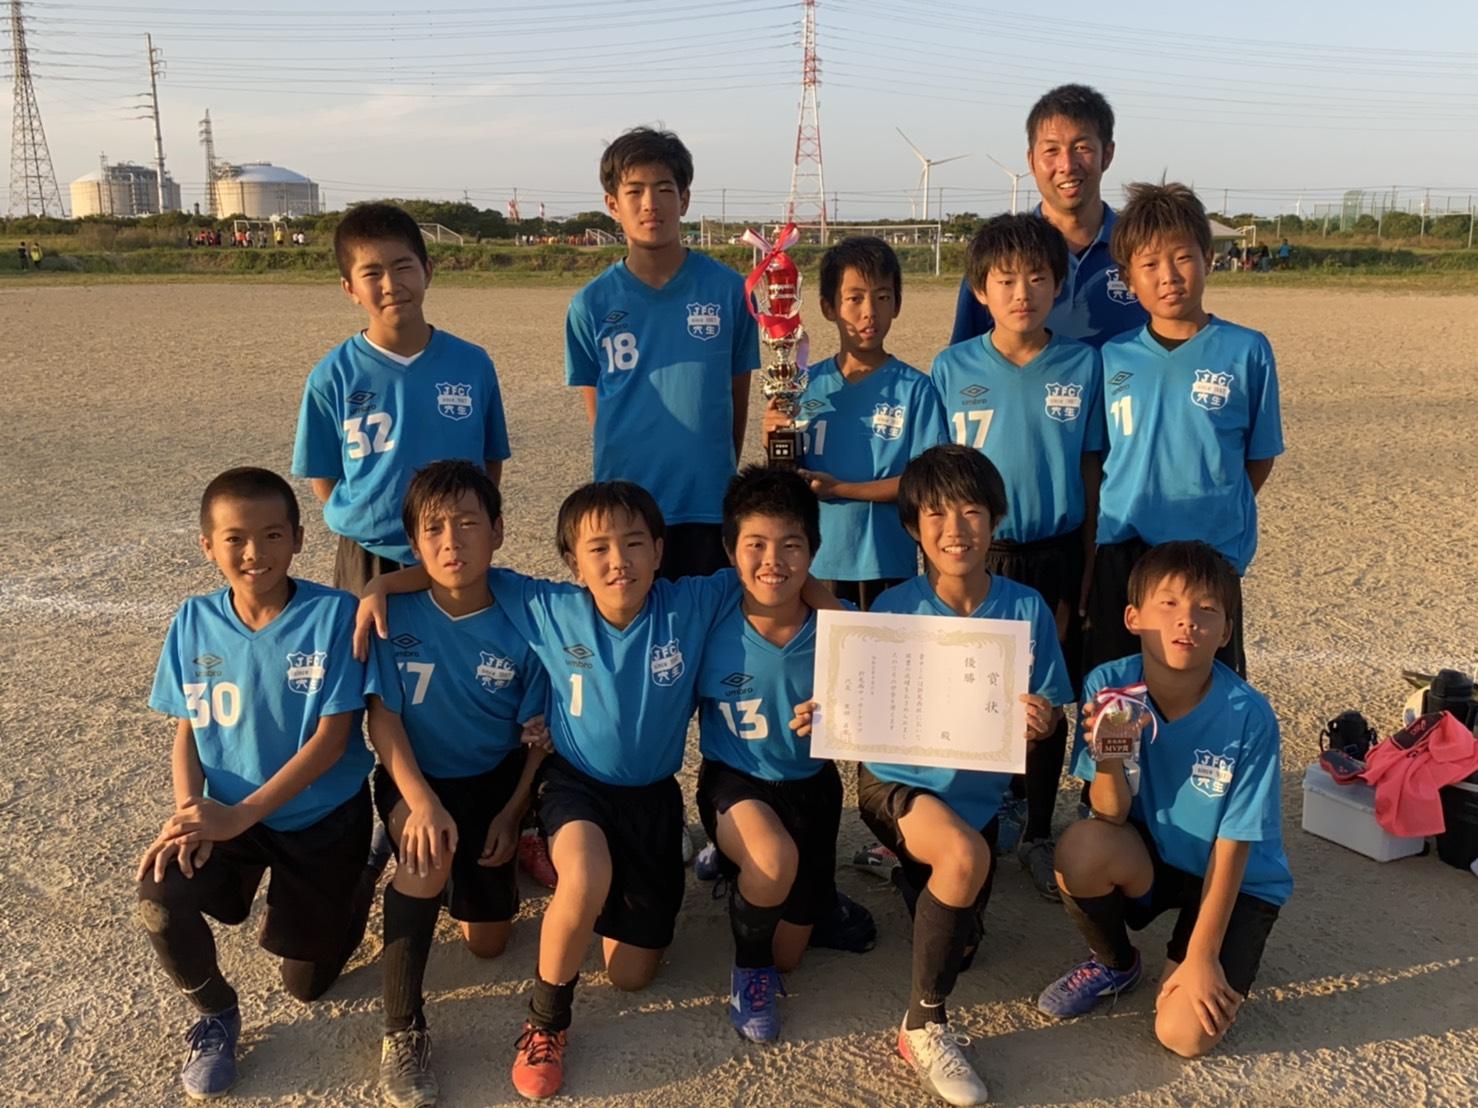 U-12折西カップ 2位パート  優勝!  2019/10/6